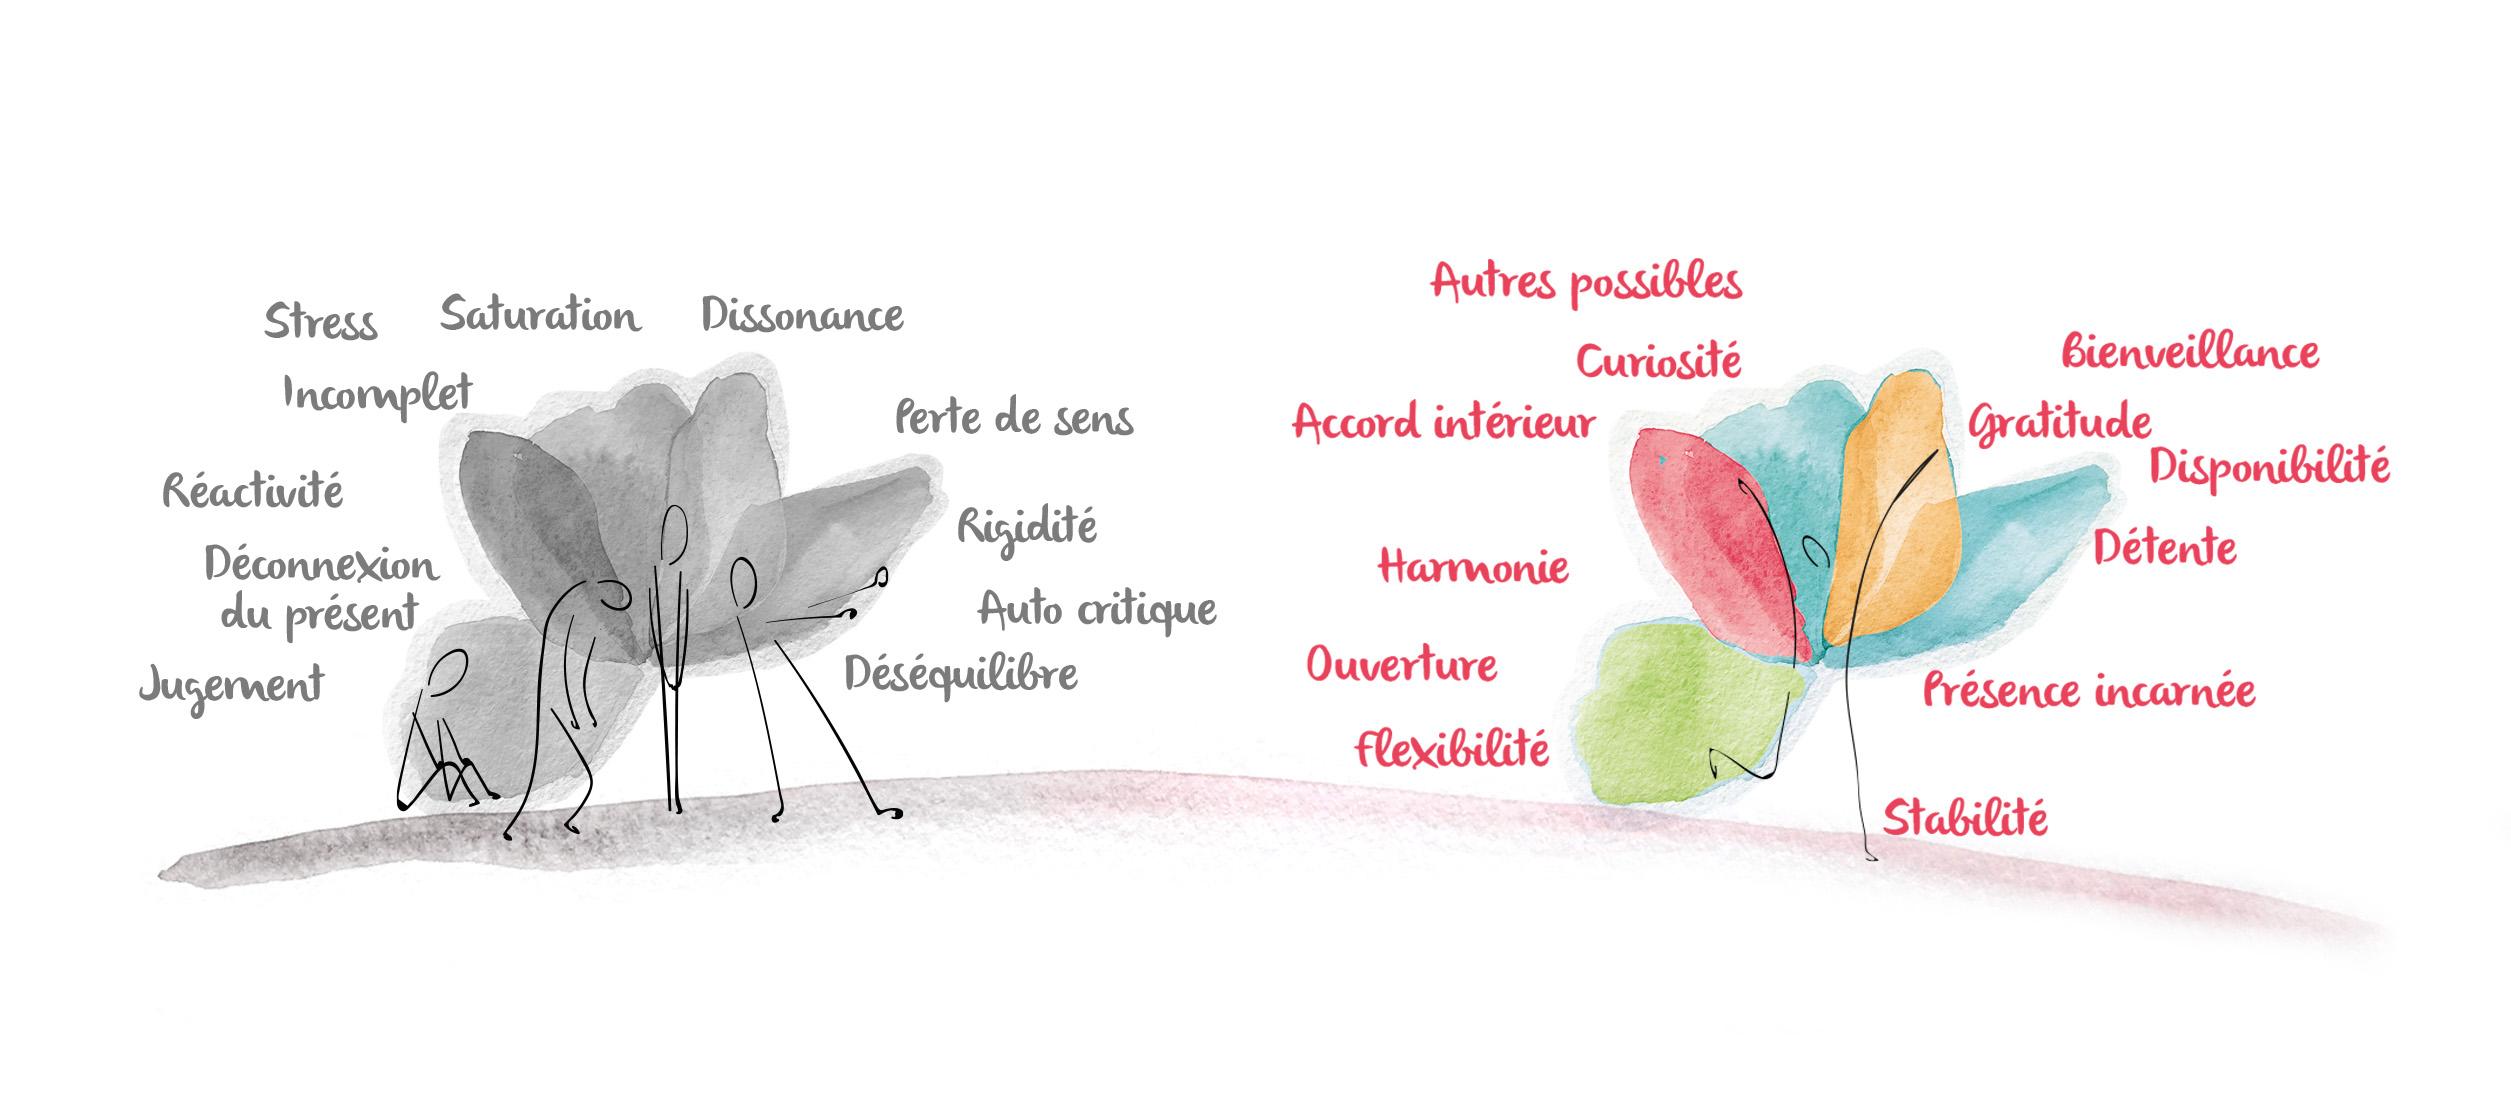 illustration-motivations-evolutions-pleine-conscience